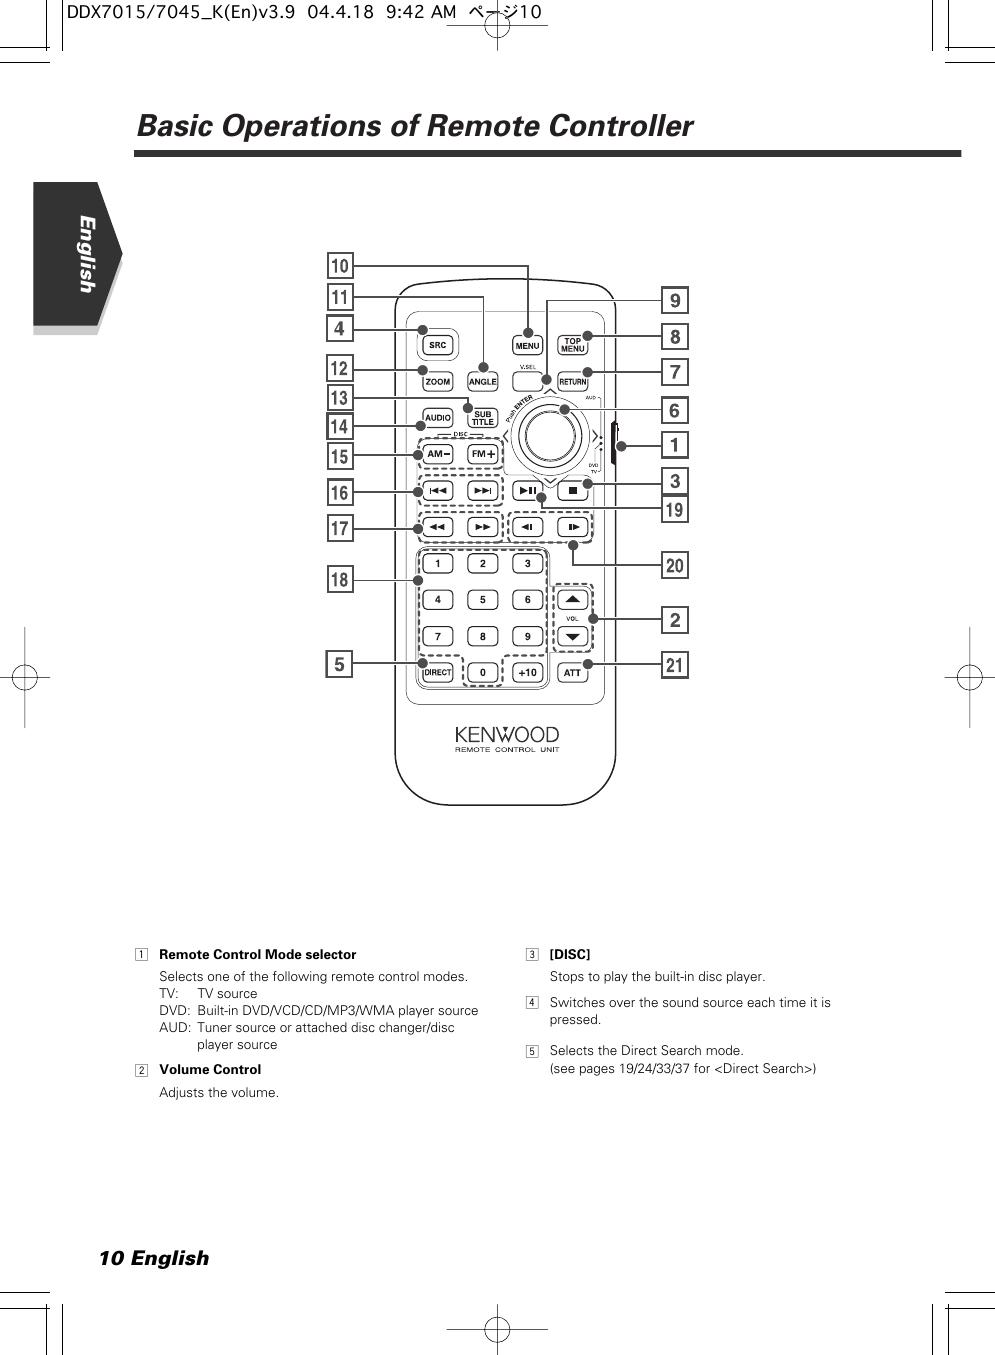 Ddx7015 Wiring Diagram | Wiring Diagram Echo on kenwood ddx6019, kenwood wiring-diagram, kenwood remote control, kenwood instruction manual, kenwood power supply,